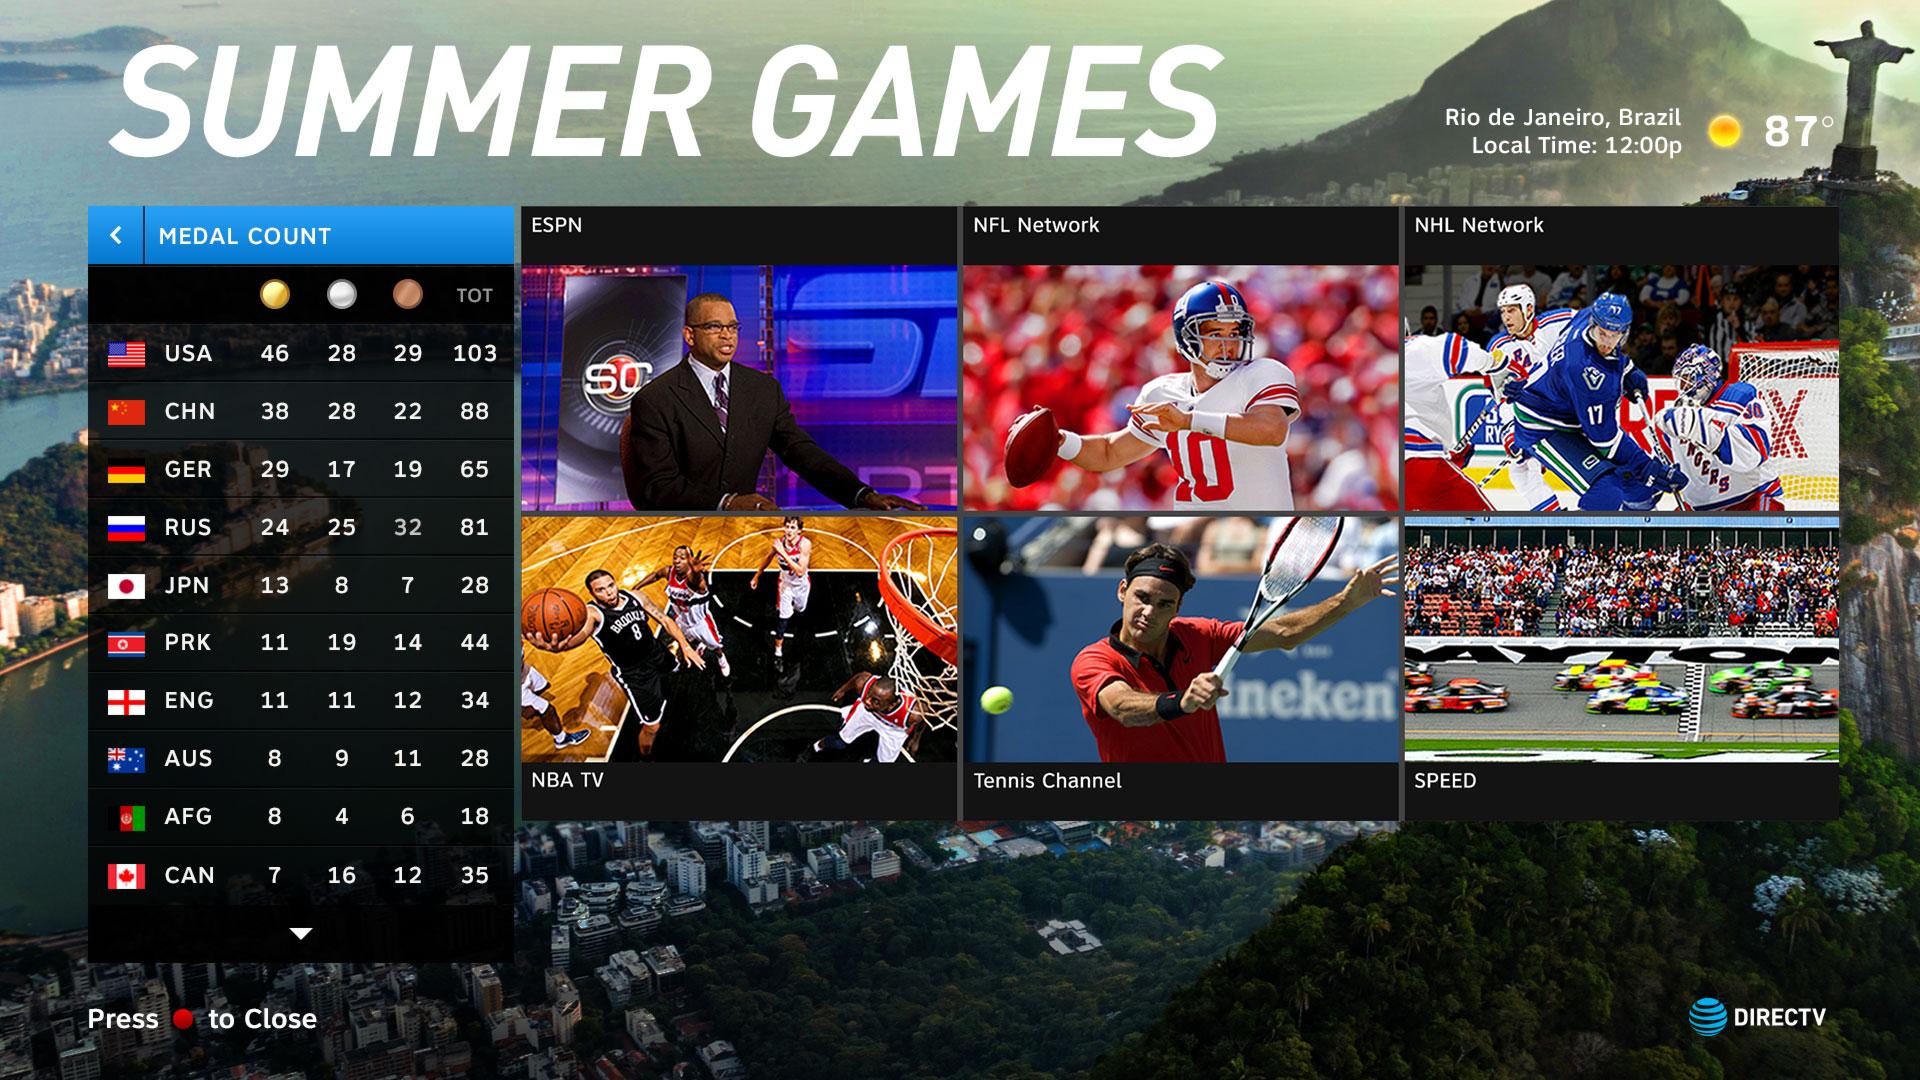 09STB_Olympics_medalcount_Rio.jpg